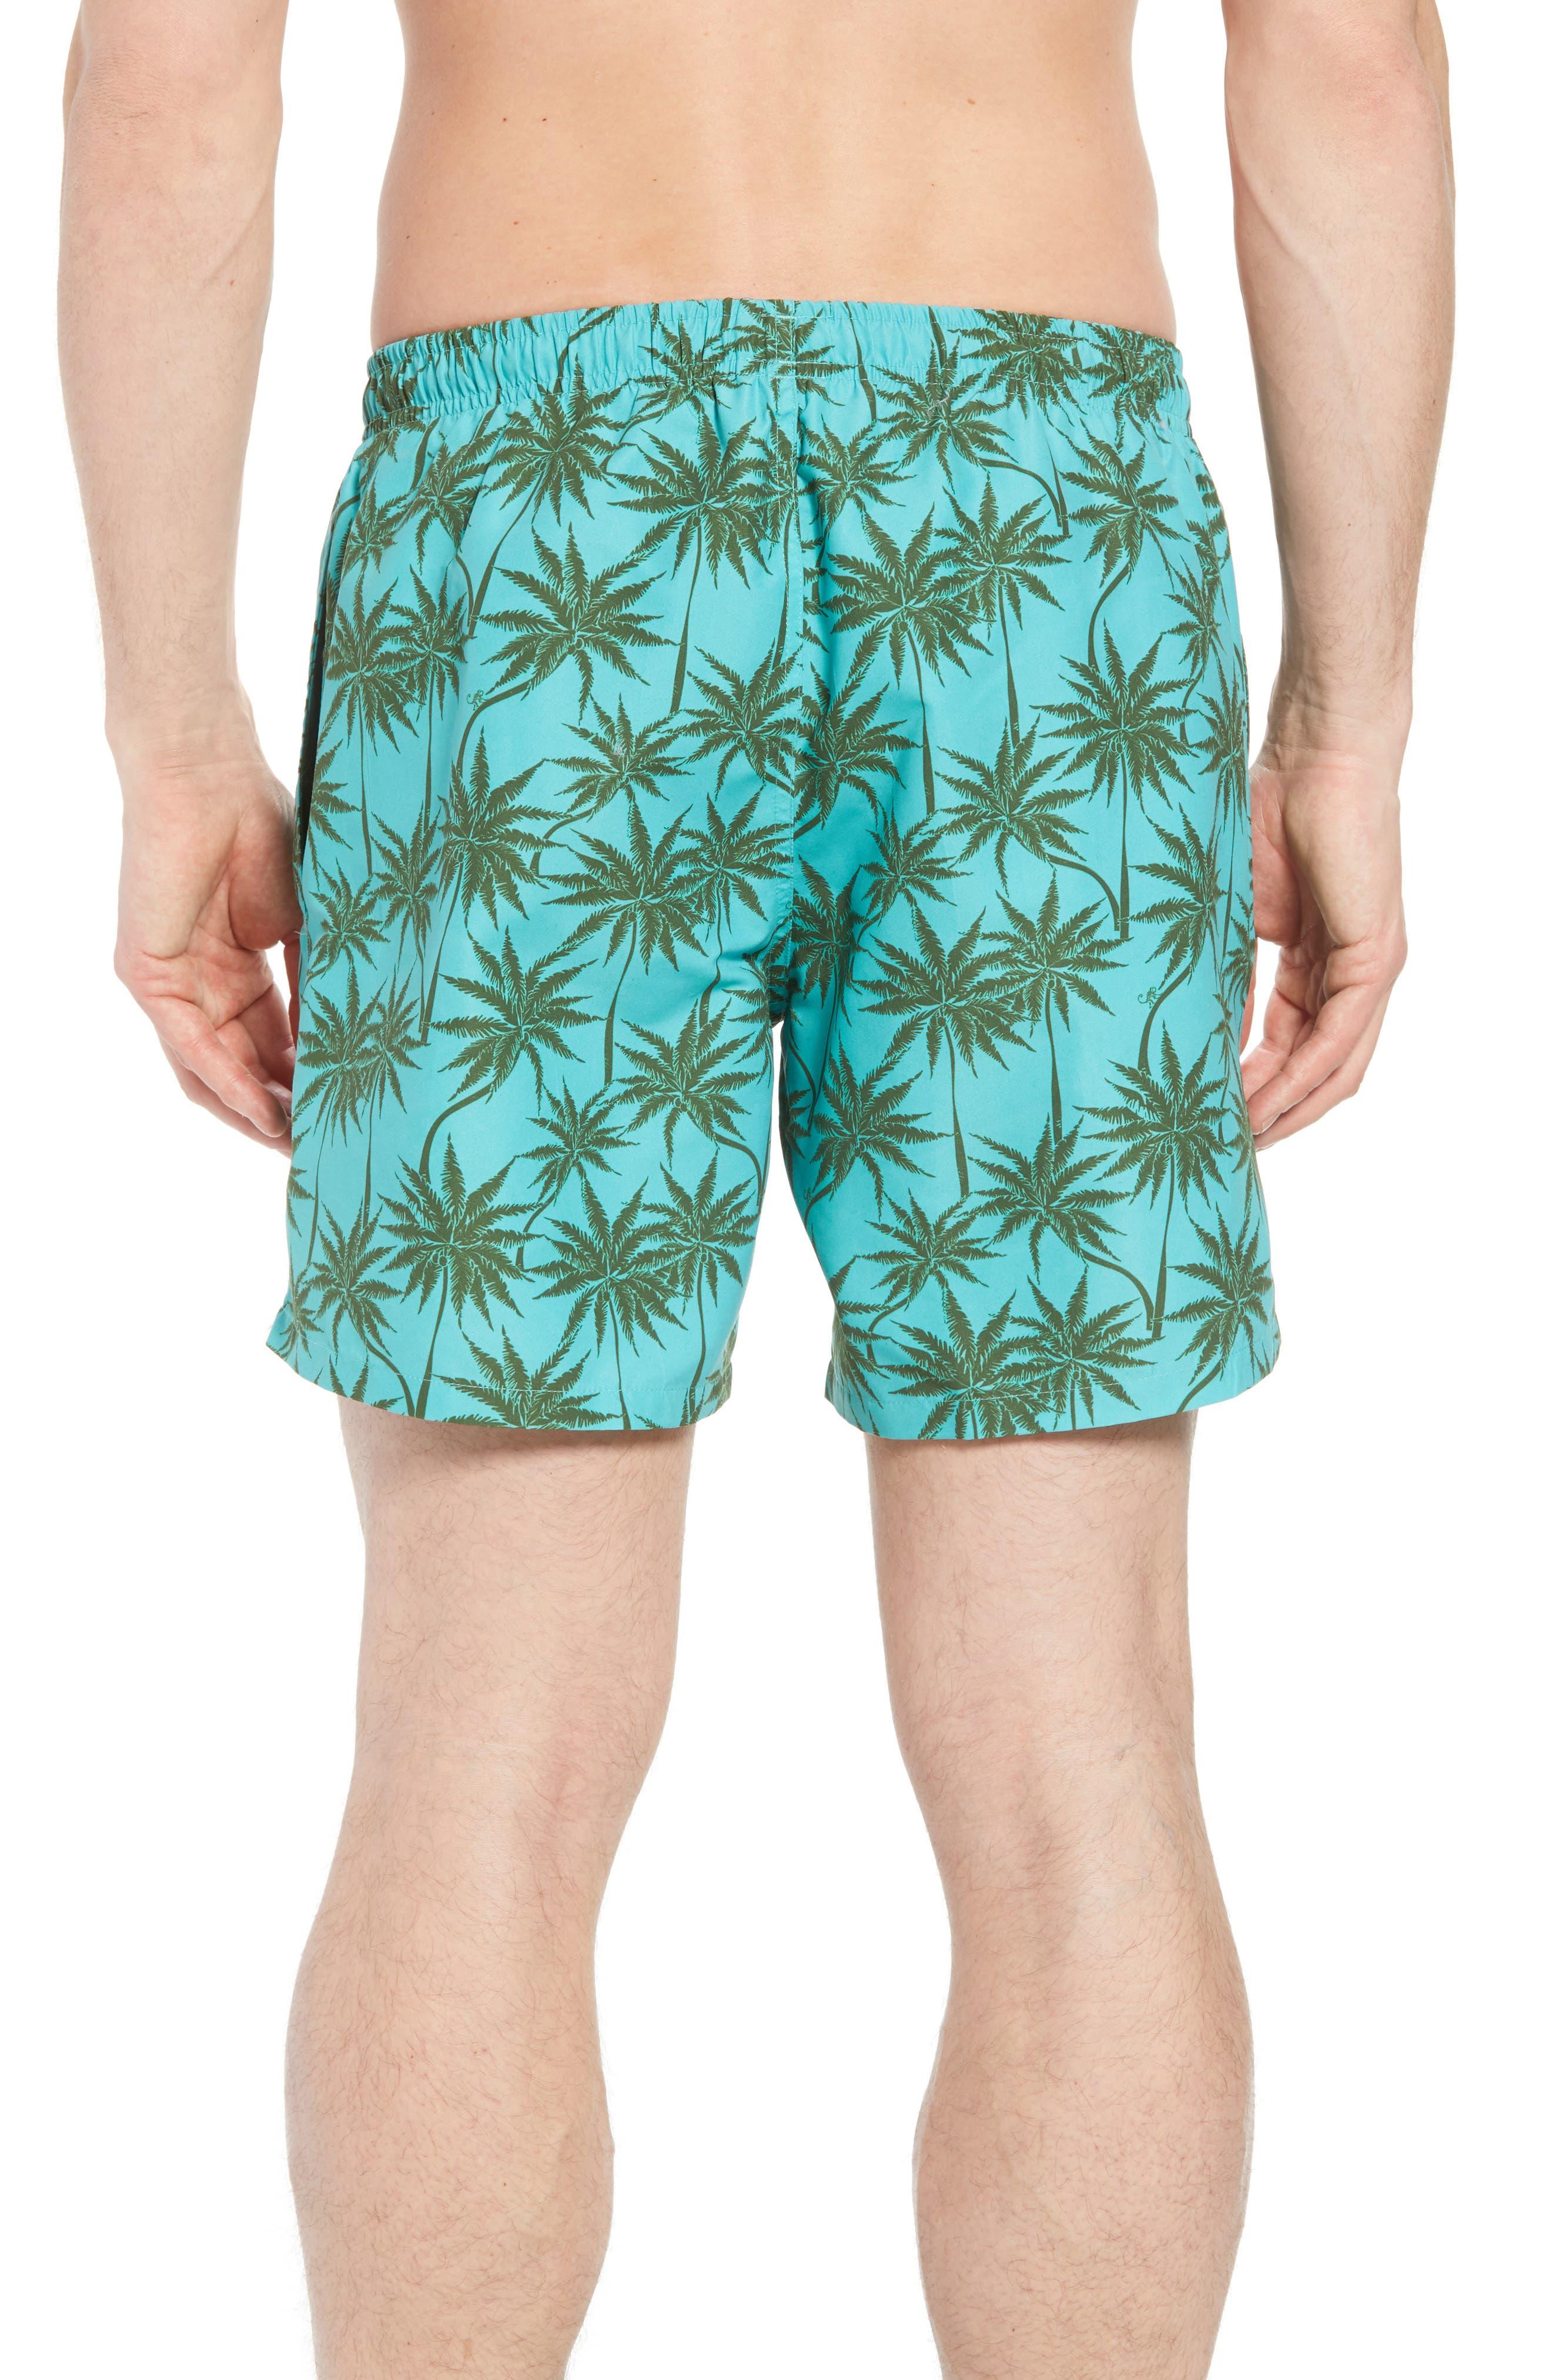 Piranha Palm Tree Swim Trunks,                             Alternate thumbnail 2, color,                             483